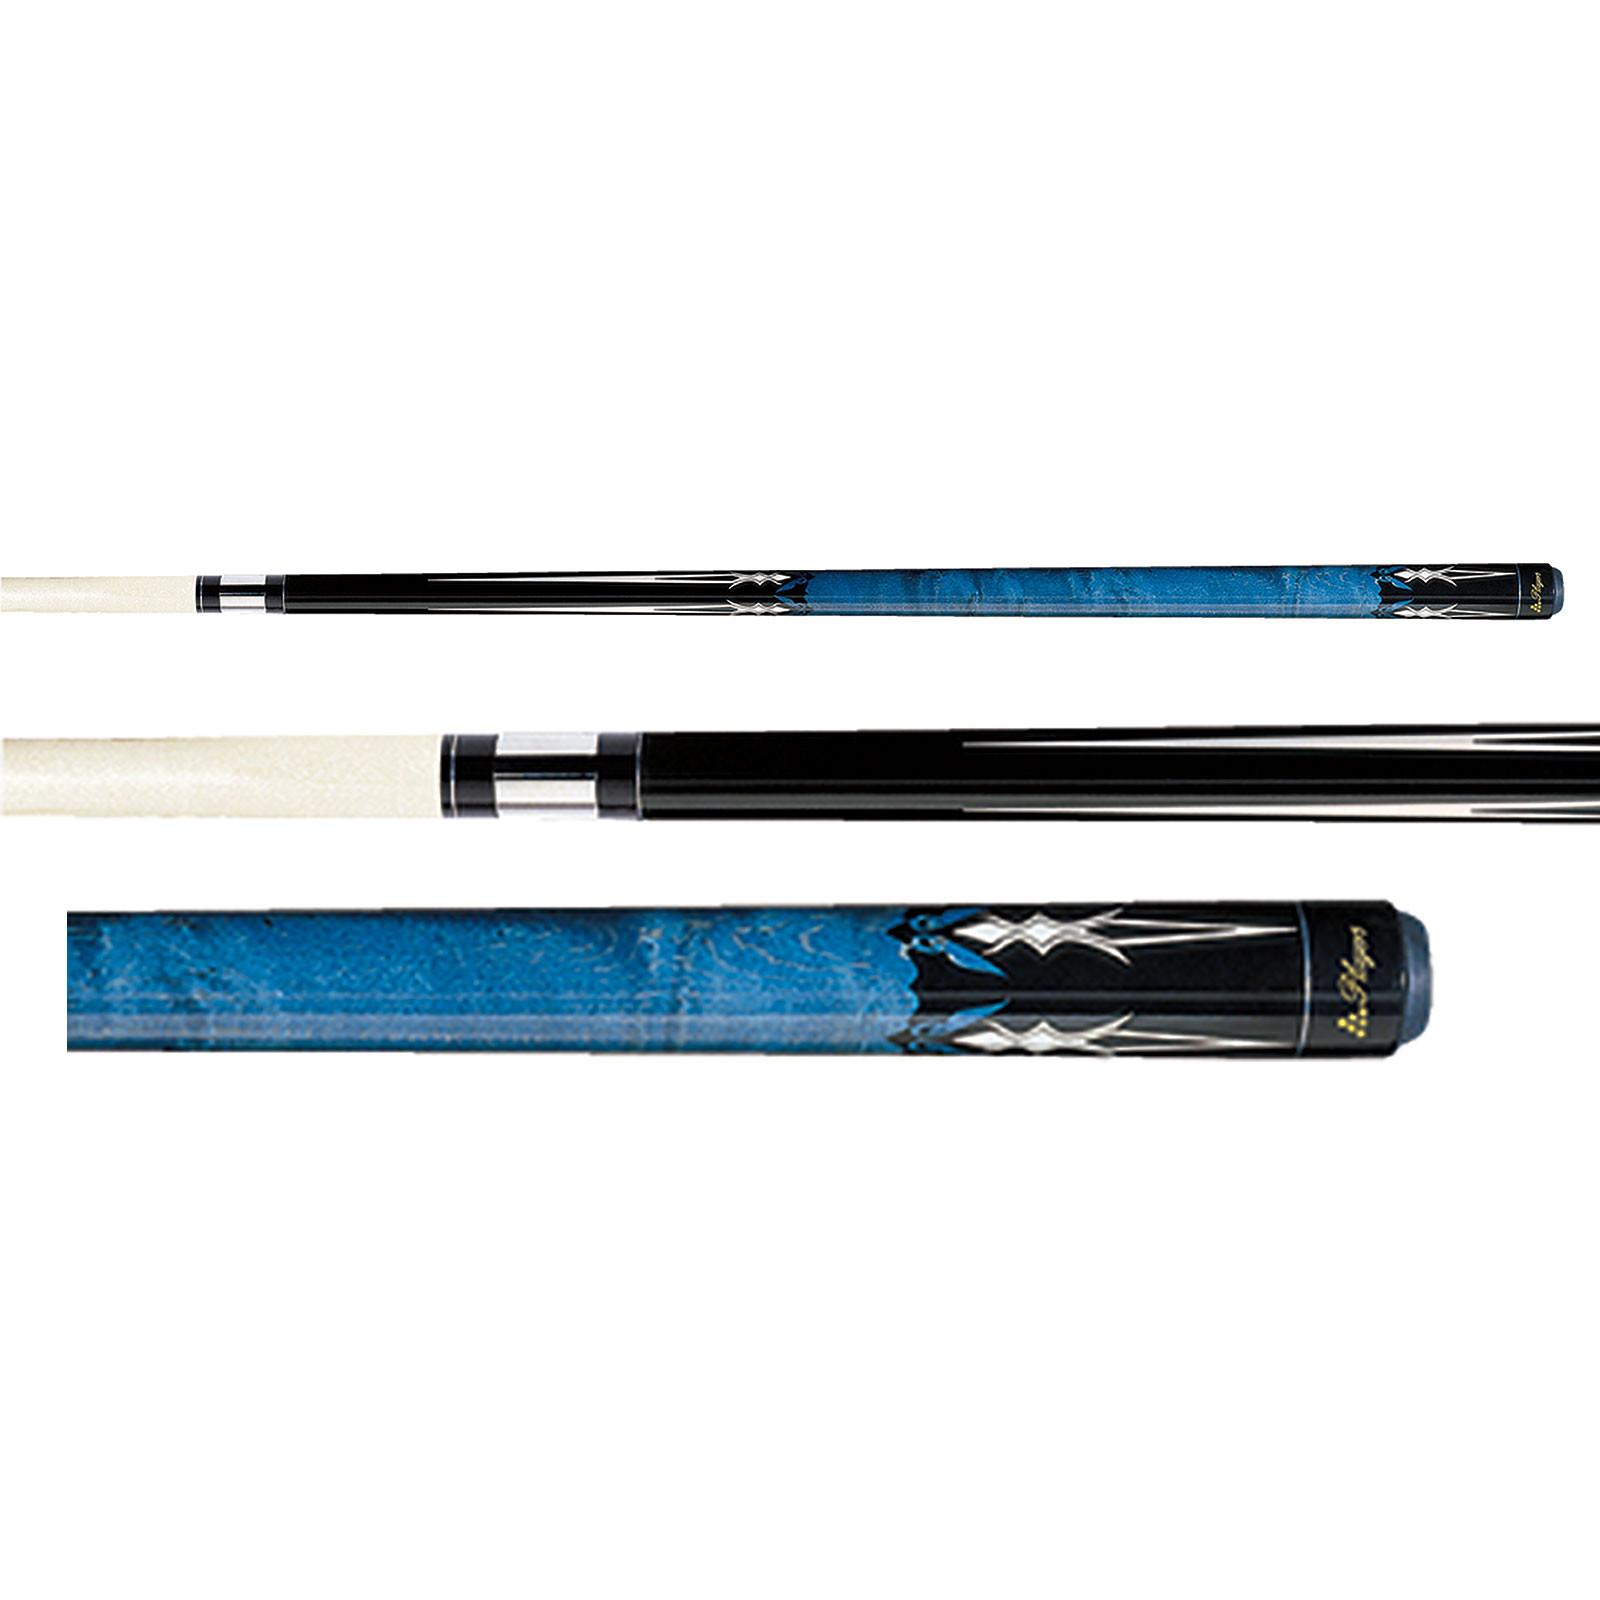 Players G-2218 Cobalt Blue Pool Cue Stick